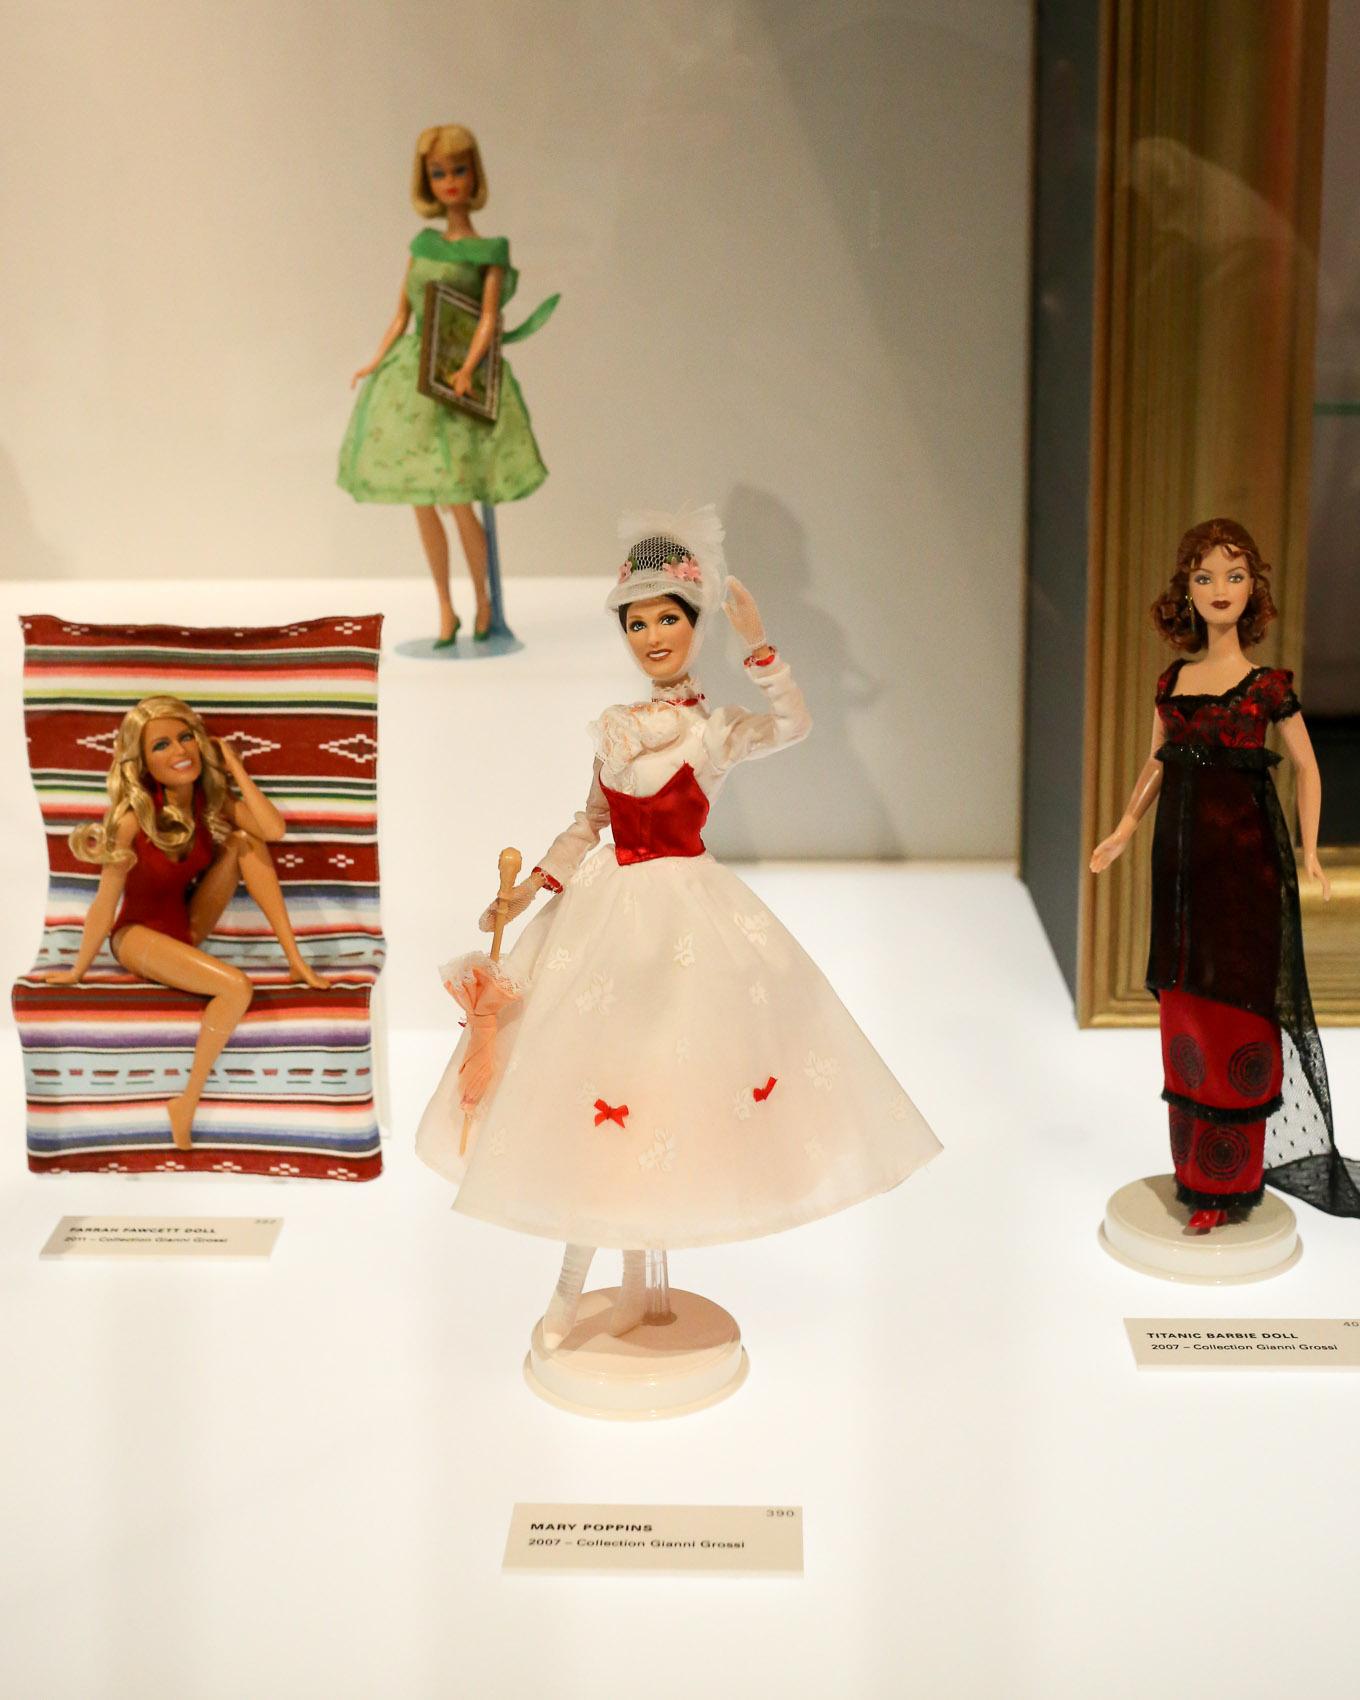 Kansallismuseo - Barbie-näyttely-10.jpg